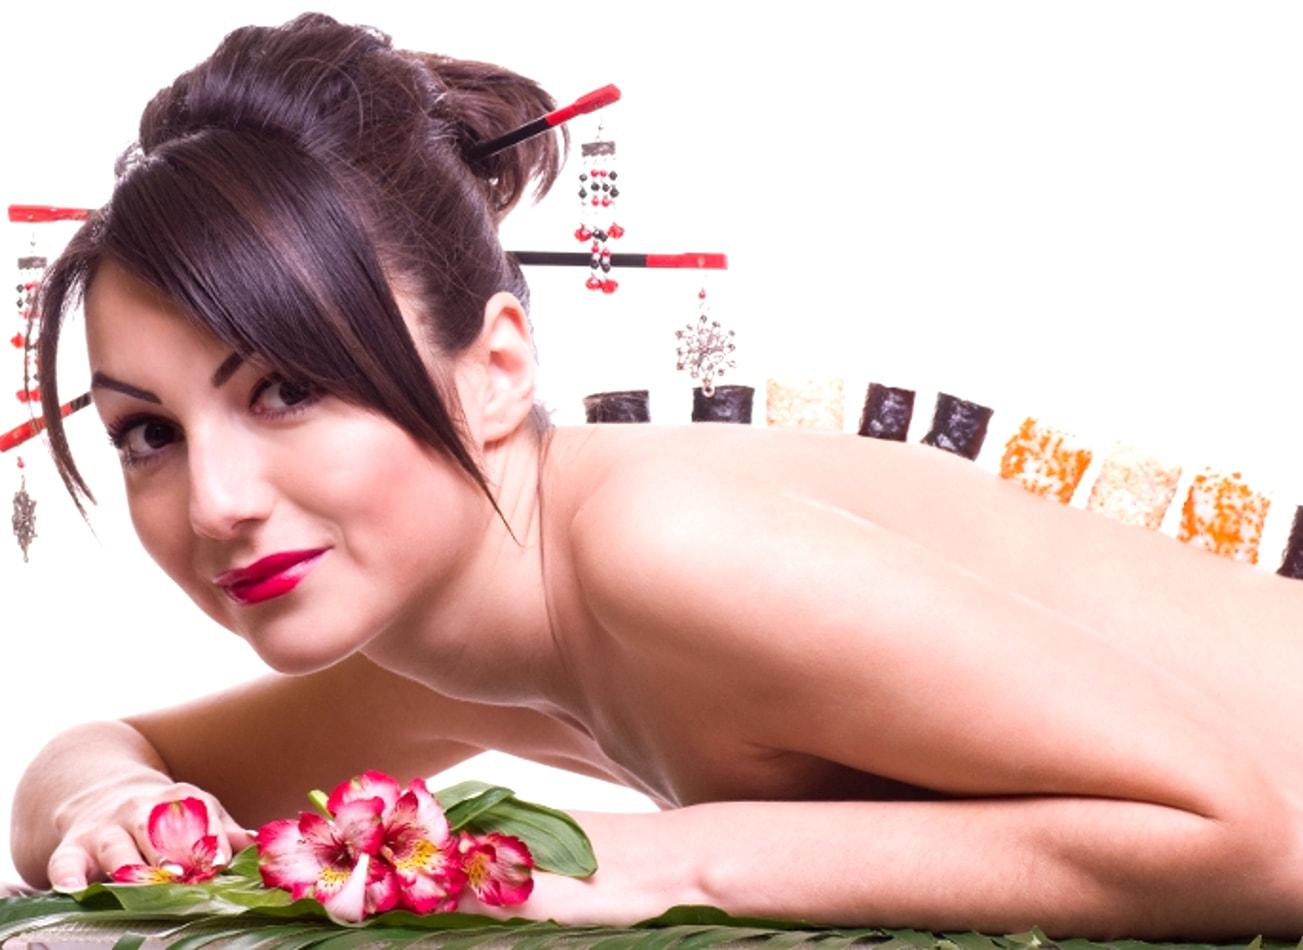 body sushi strip bucarest activites vimigo